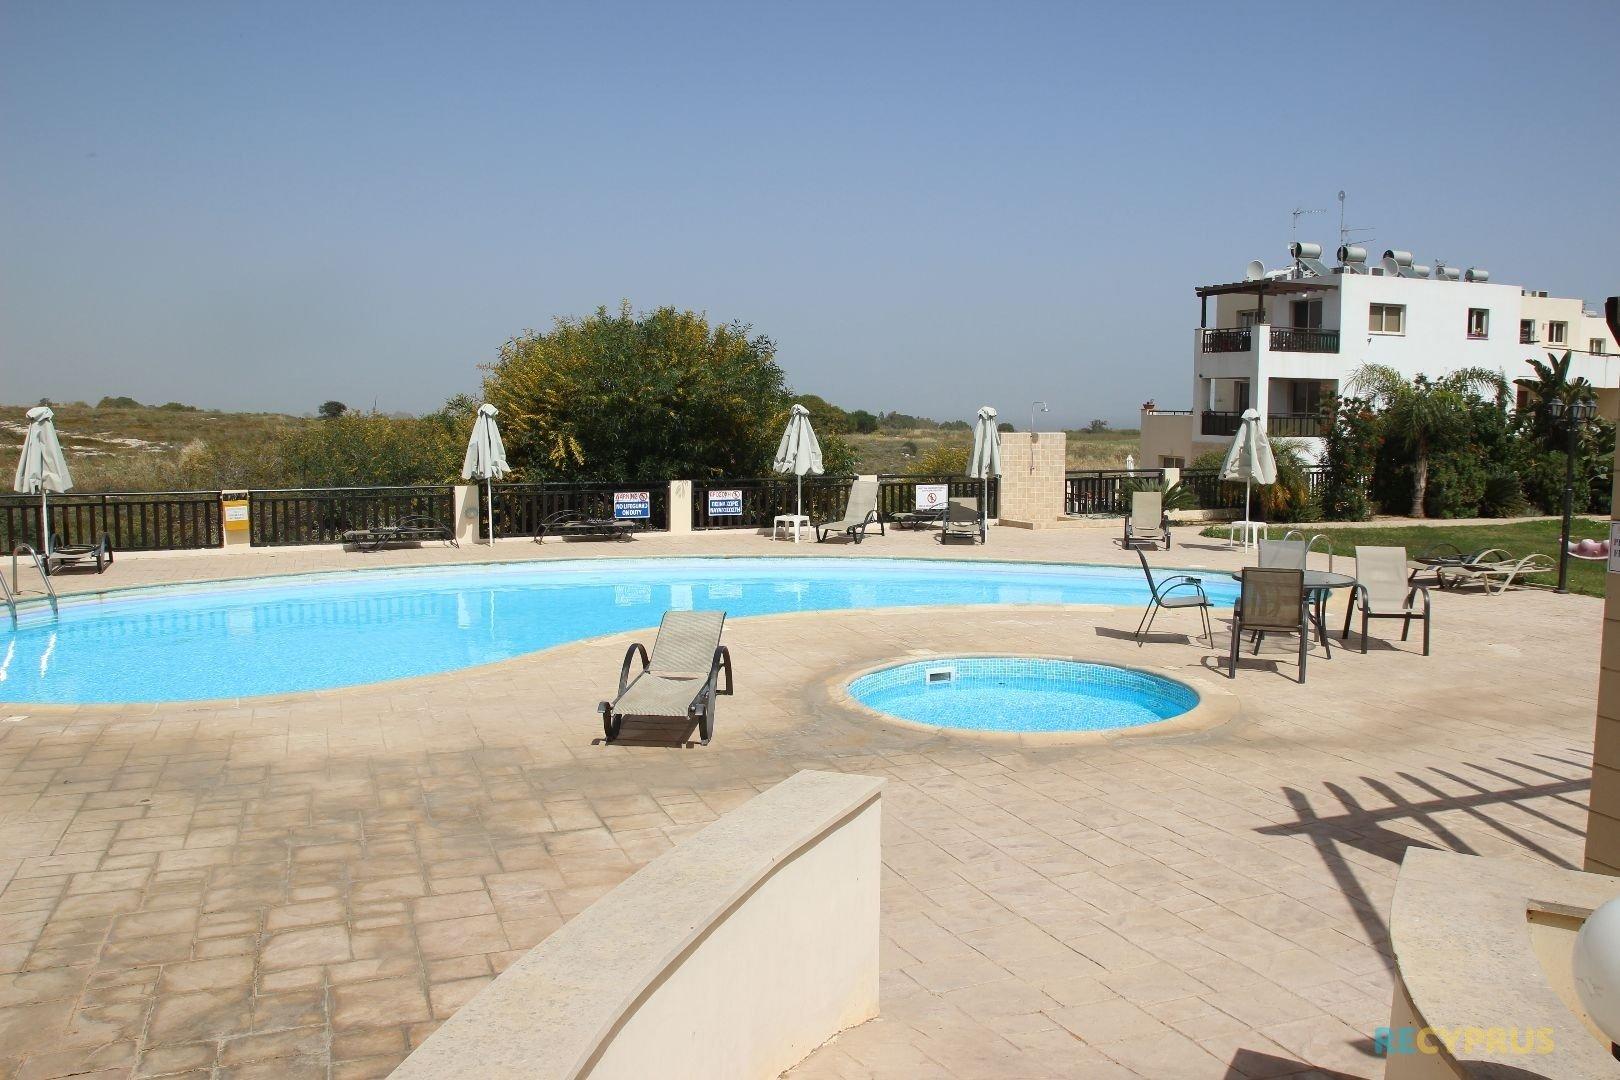 Apartment for sale Kapparis Famagusta Cyprus 9 3560